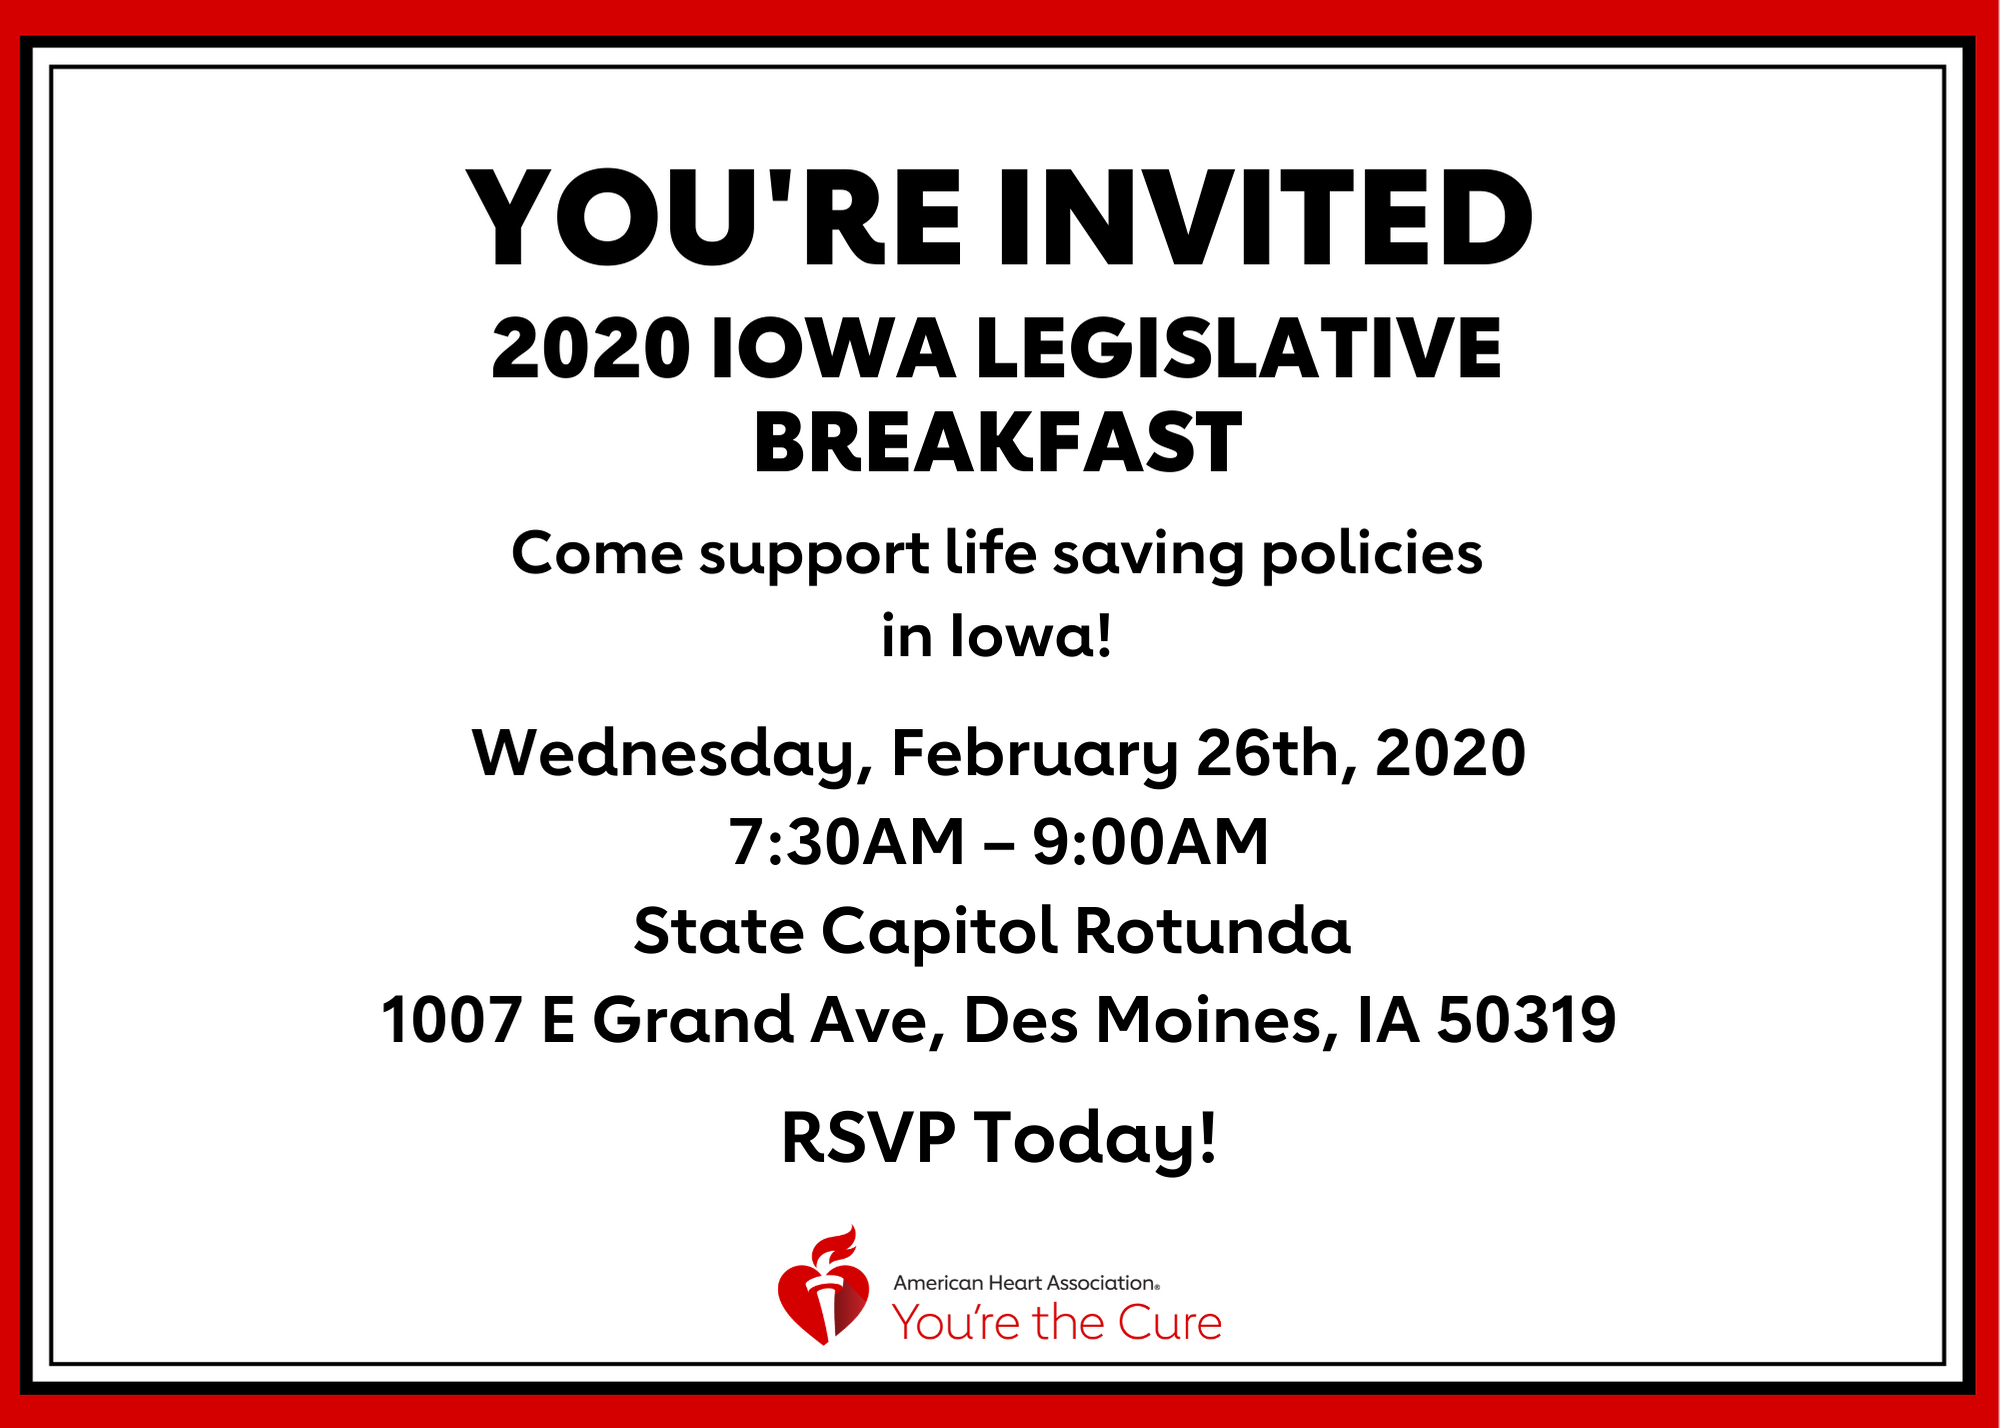 Legislative Breakfast invite with event details